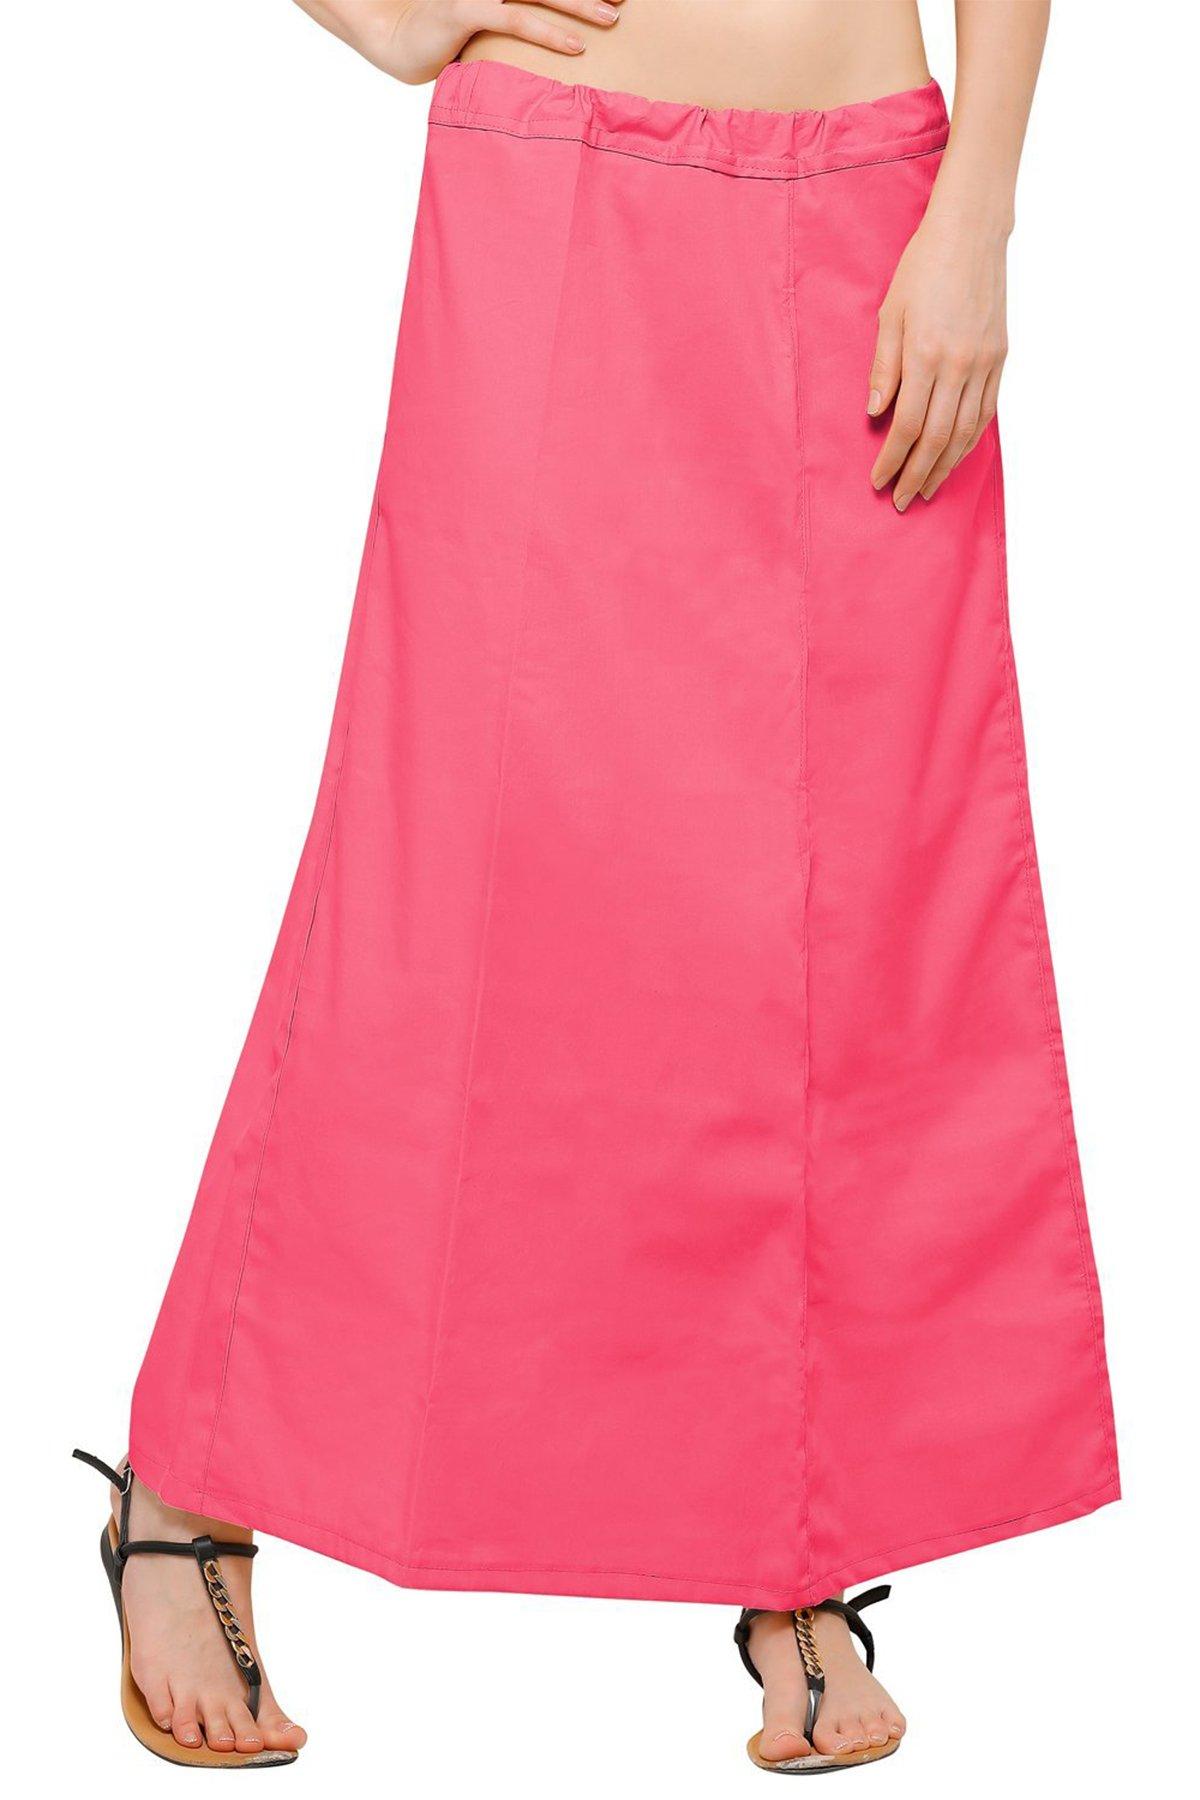 Chandrakala Women's Readymade Cotton Floor Length Free Size Petticoat Underskirt Slips for Indian Sarees(P104PEA4)